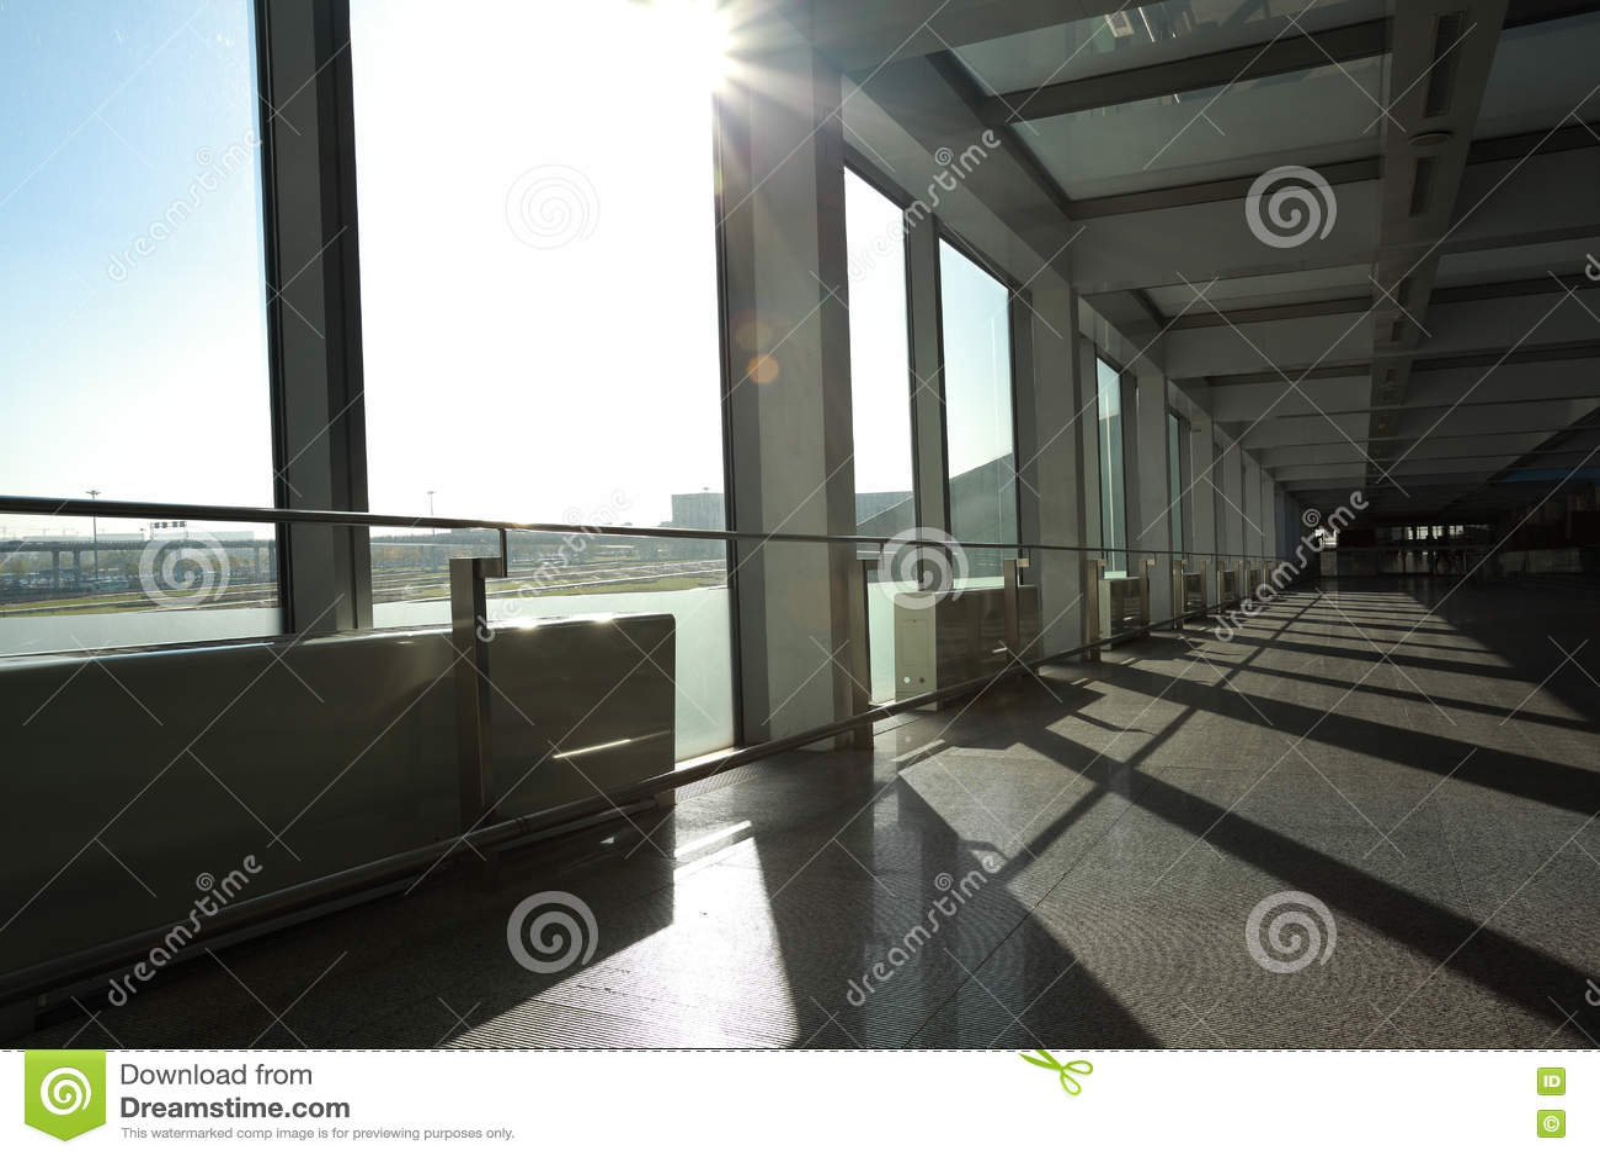 Glass office windows - Sunny On Modern Glass Office Windows Building Interior Corridor